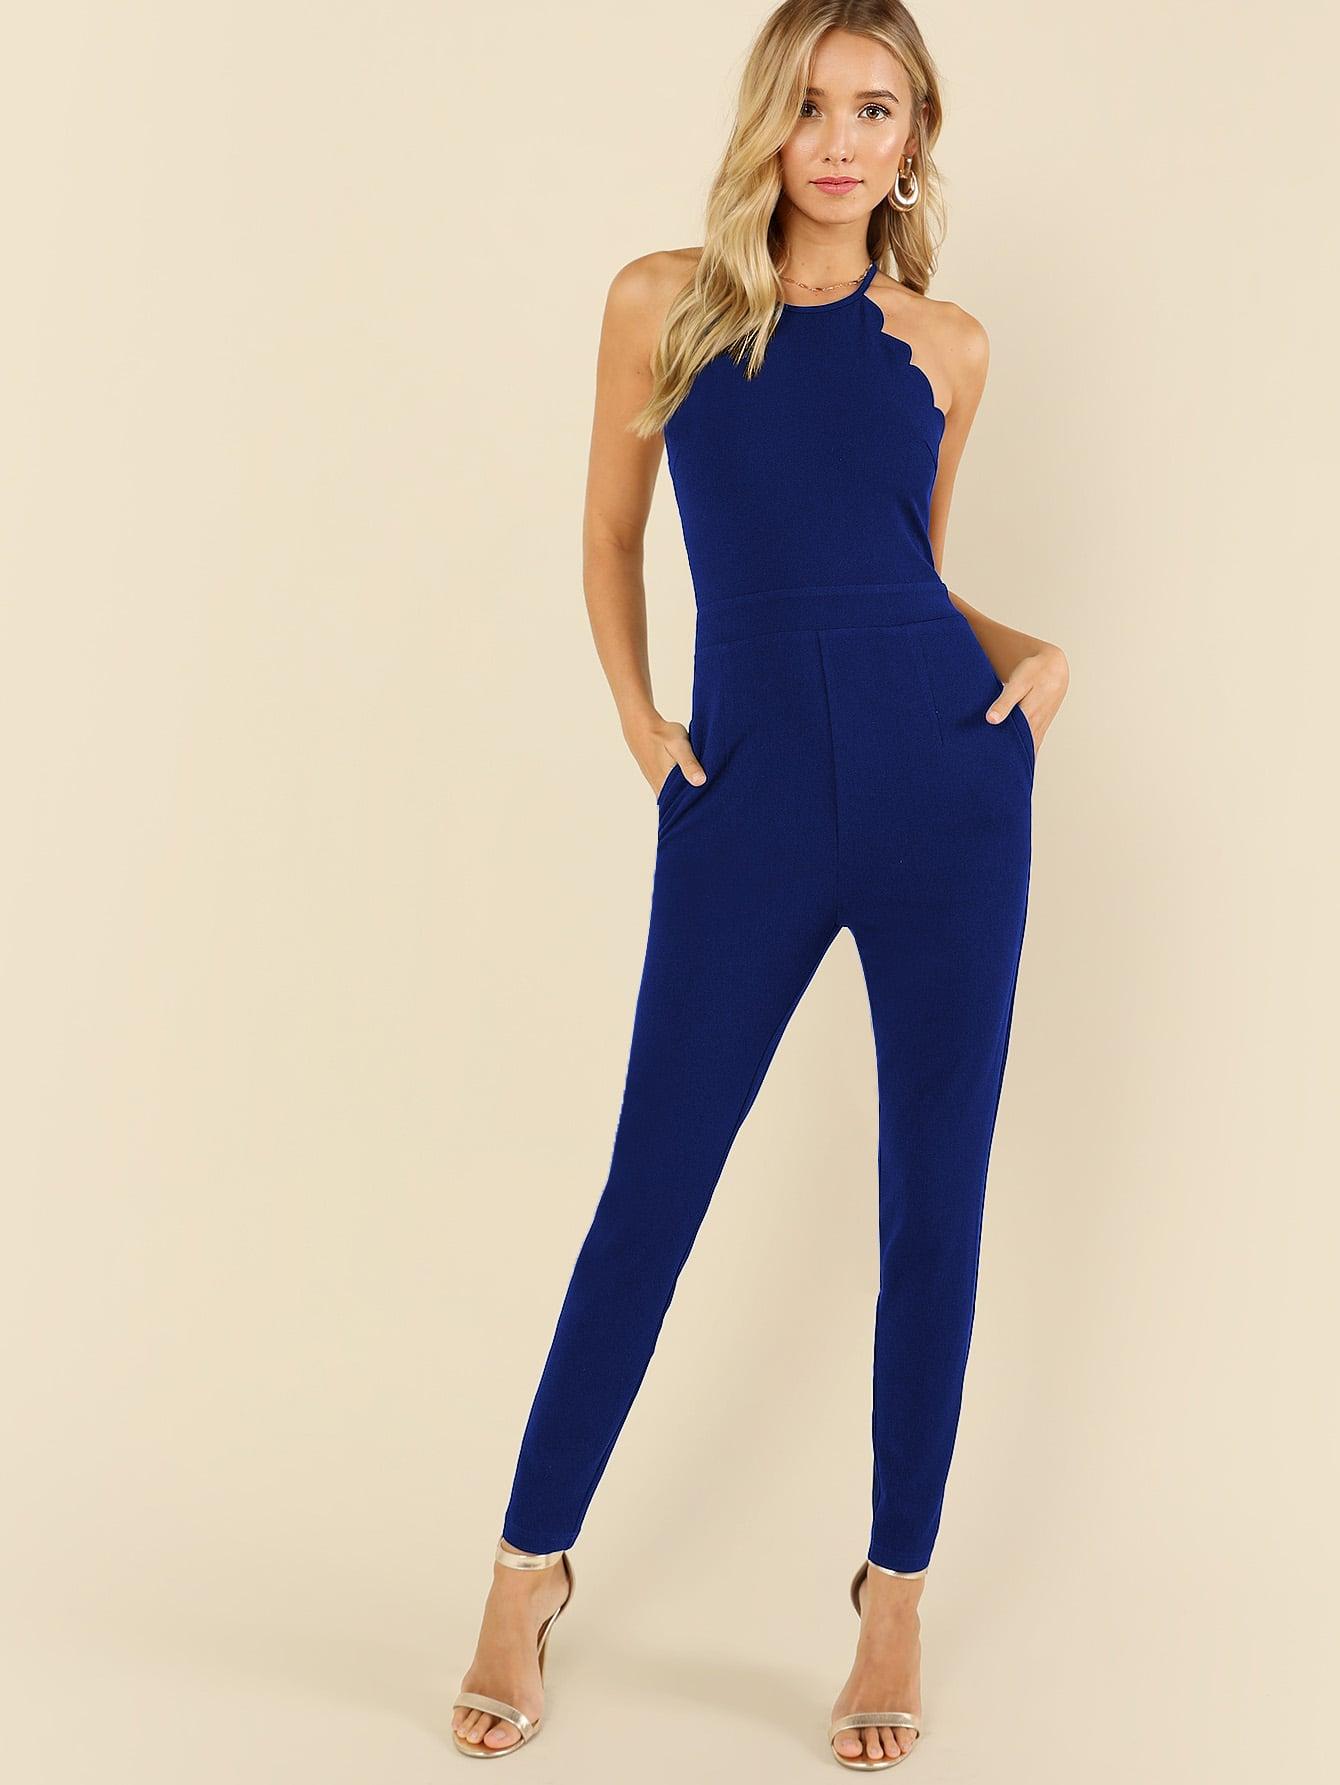 Scallop Edge Halter Tailored Jumpsuit plaid tailored jumpsuit